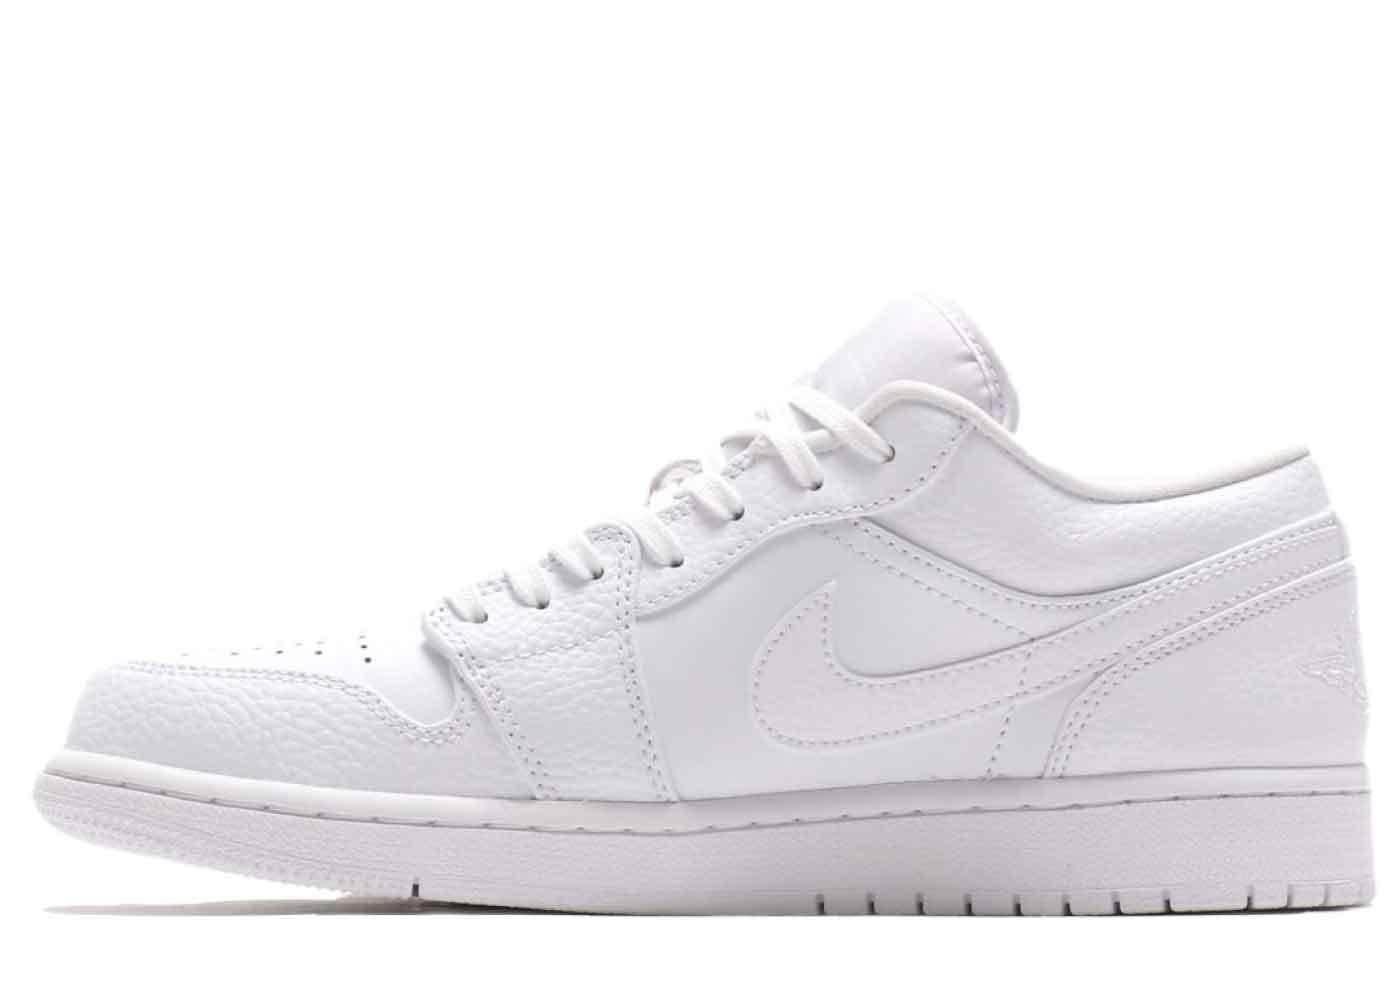 Nike Air Jordan 1 Low Triple Whiteの写真